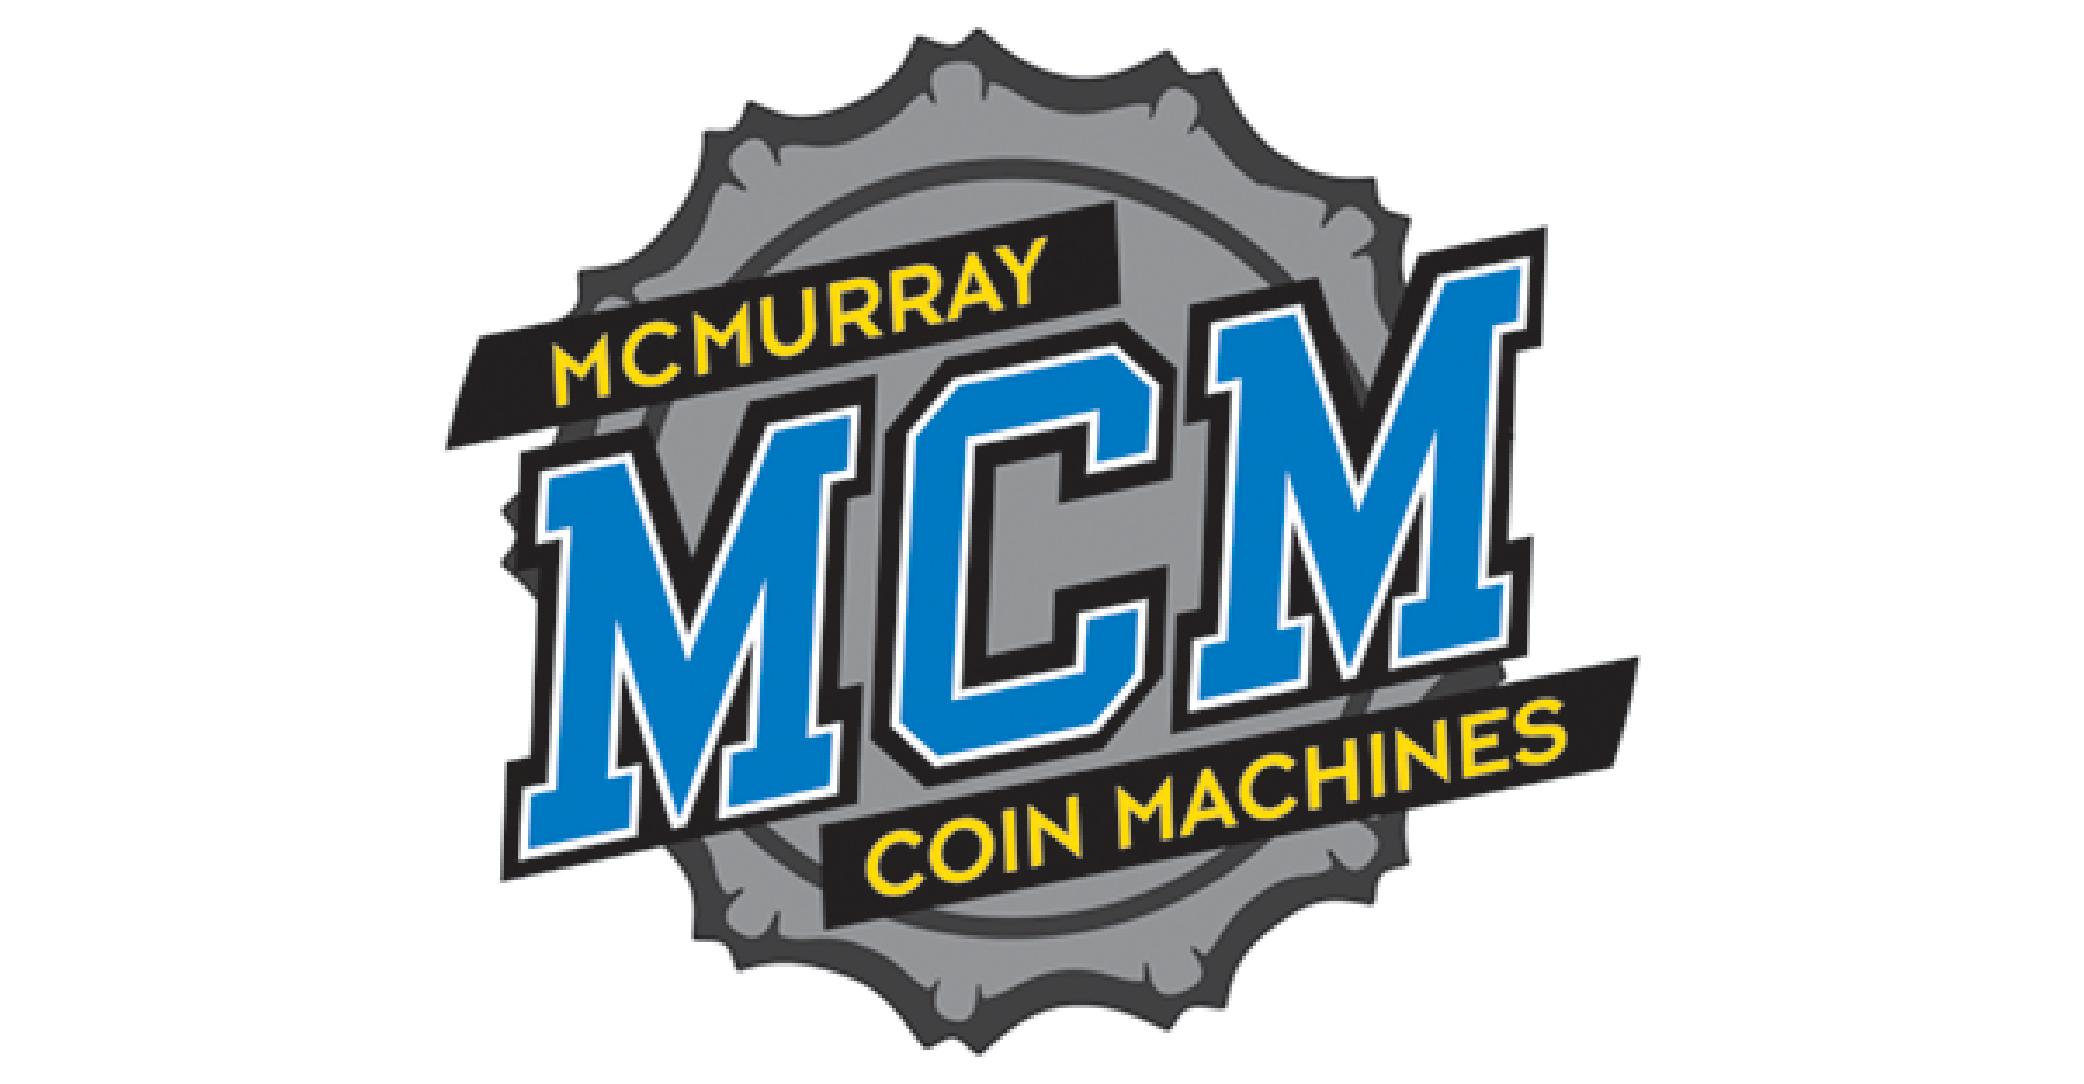 McMurray Coin